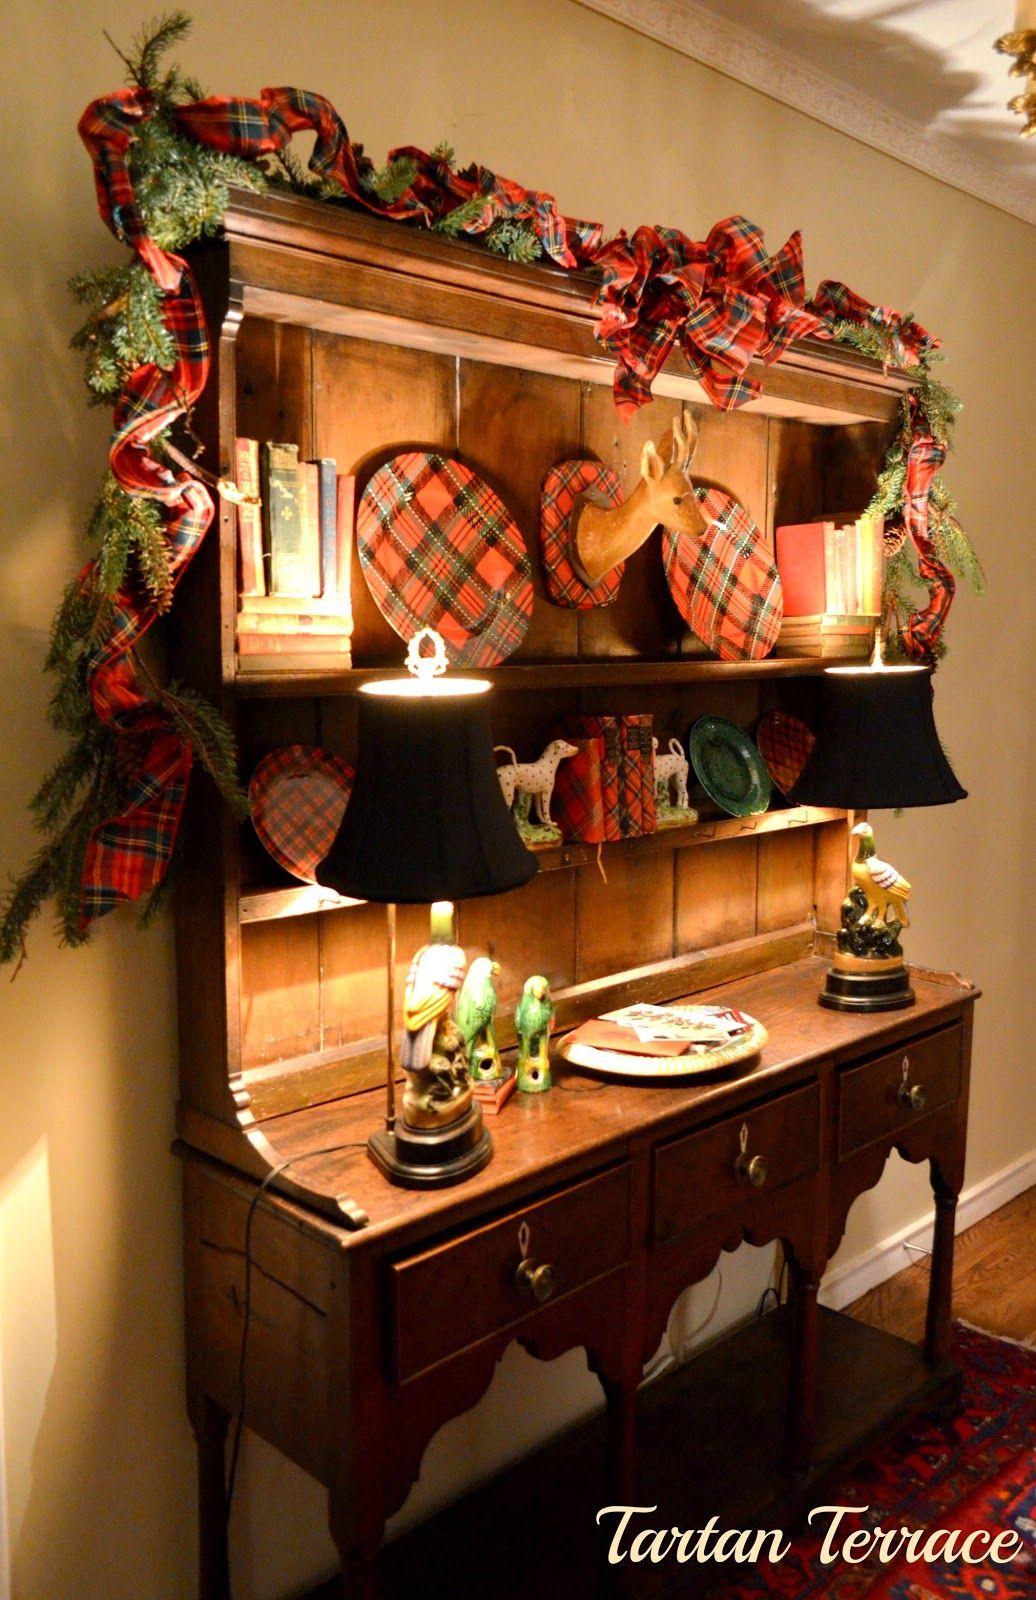 Tartanterrace welsh dresser reveal checkered sch ne for Weihnachtsideen dekoration